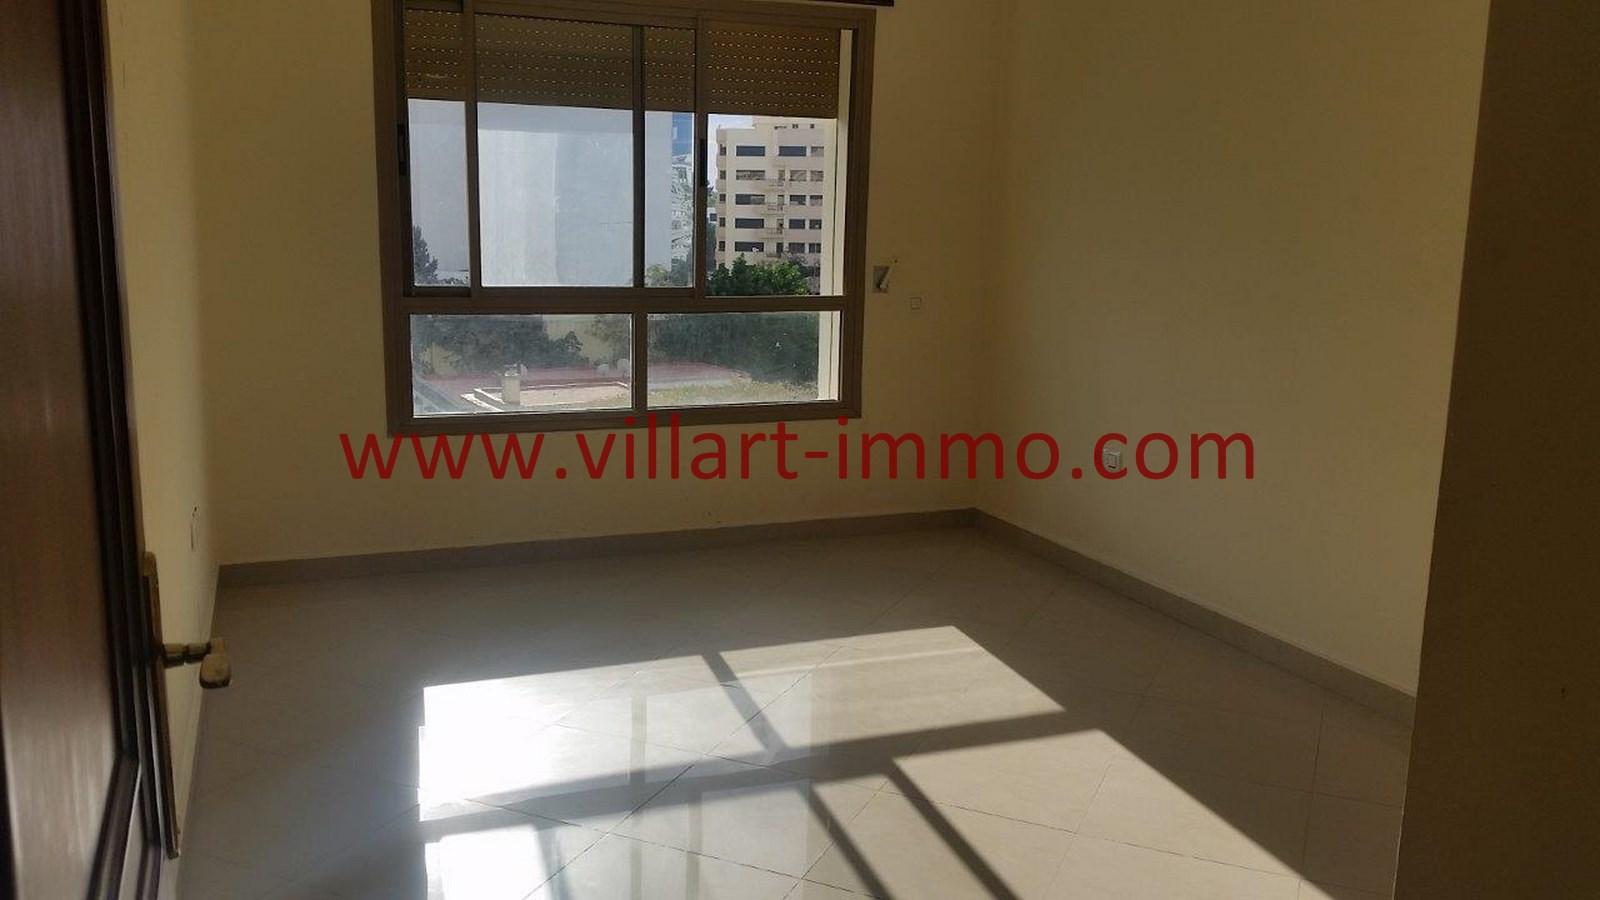 10-a-louer-appartement-tanger-iberia-chambre-3-l907-villart-immo